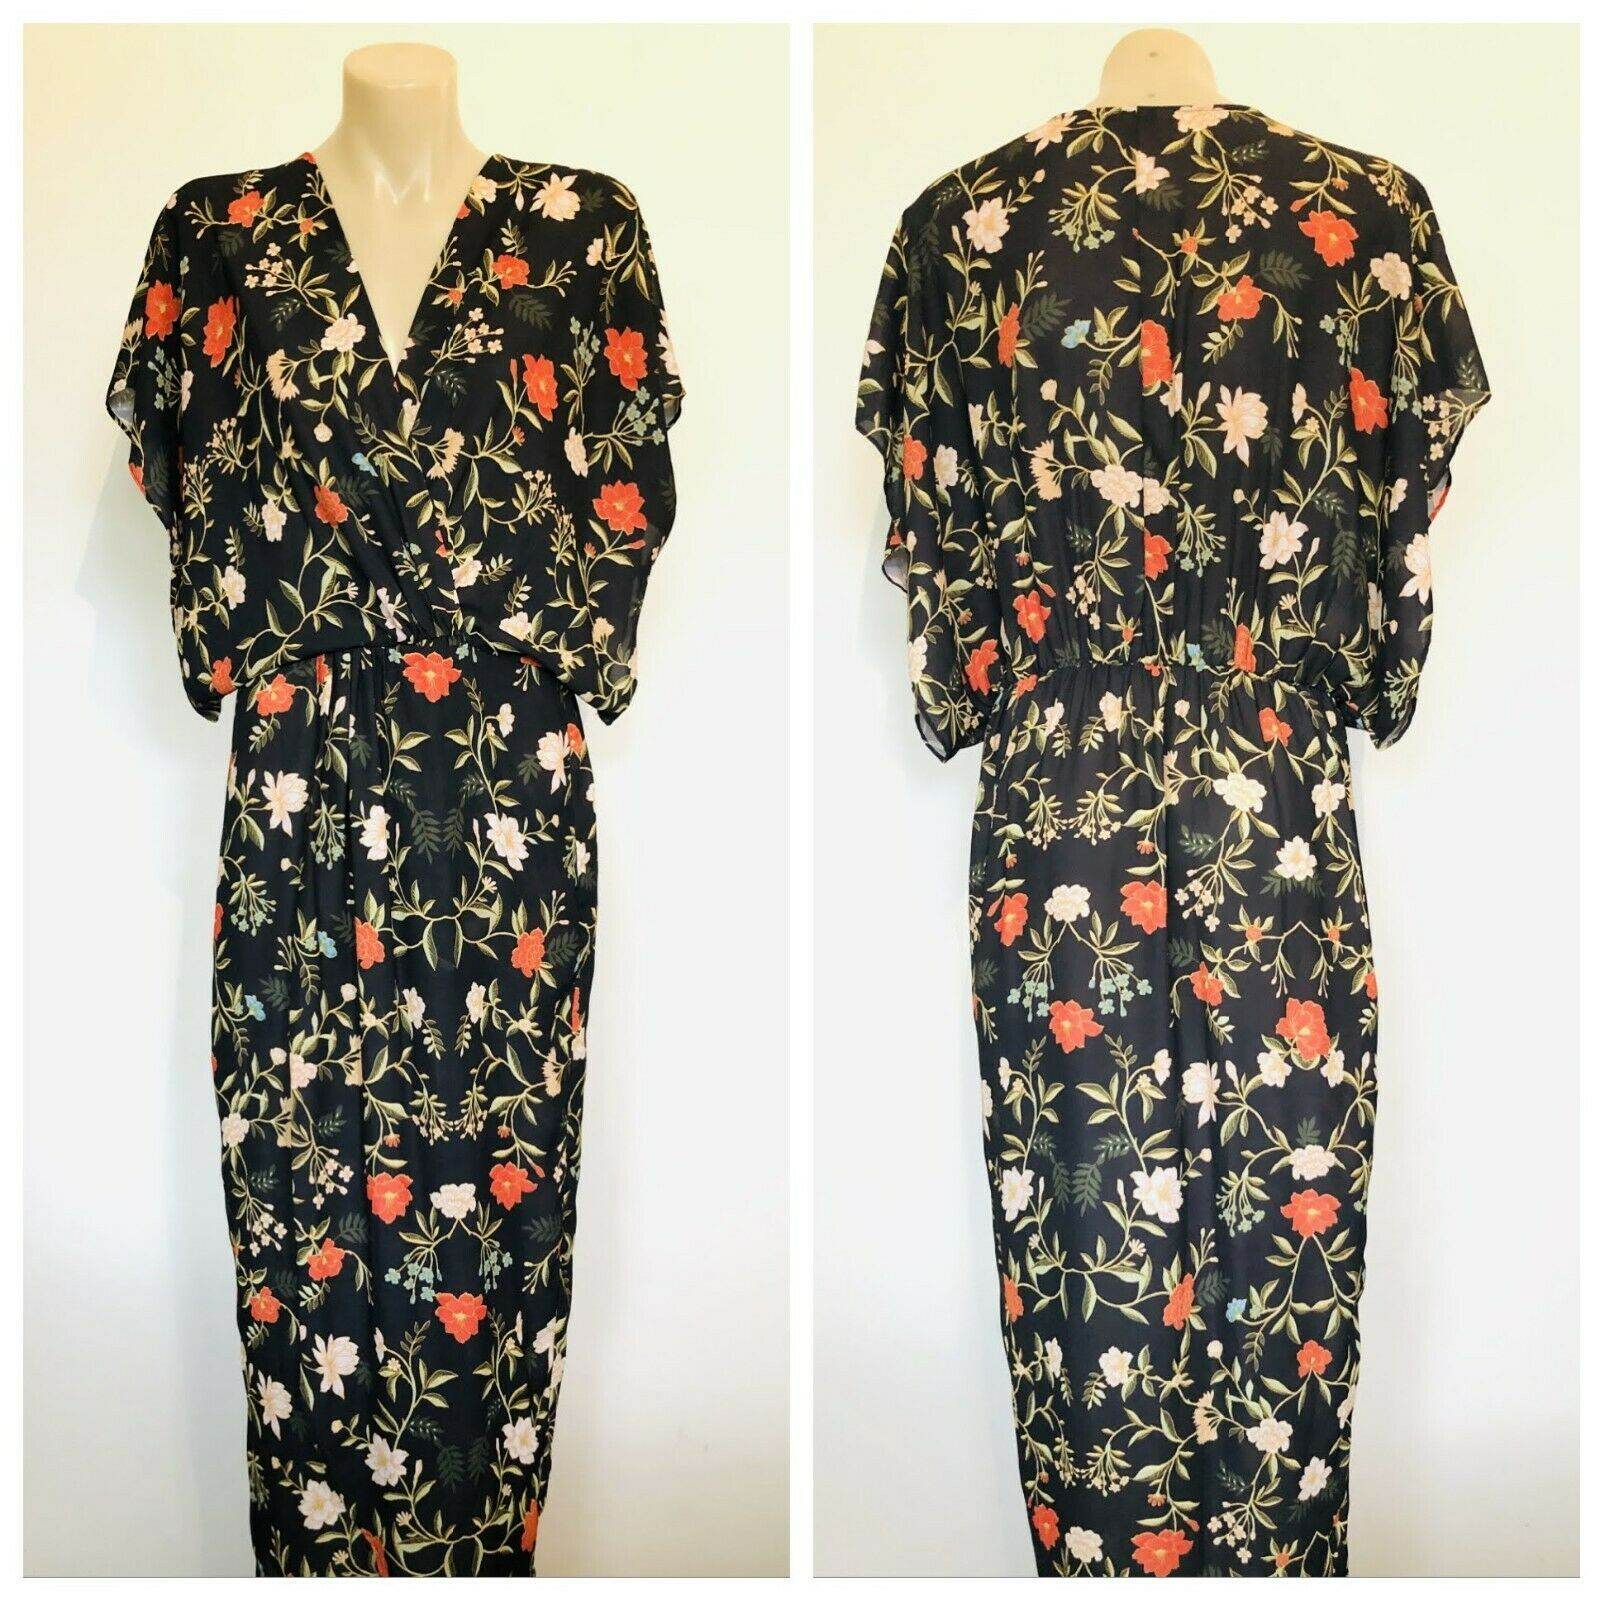 SHEIKE Women Long Black Floral Dress Short Sleeve Size 8 (S)